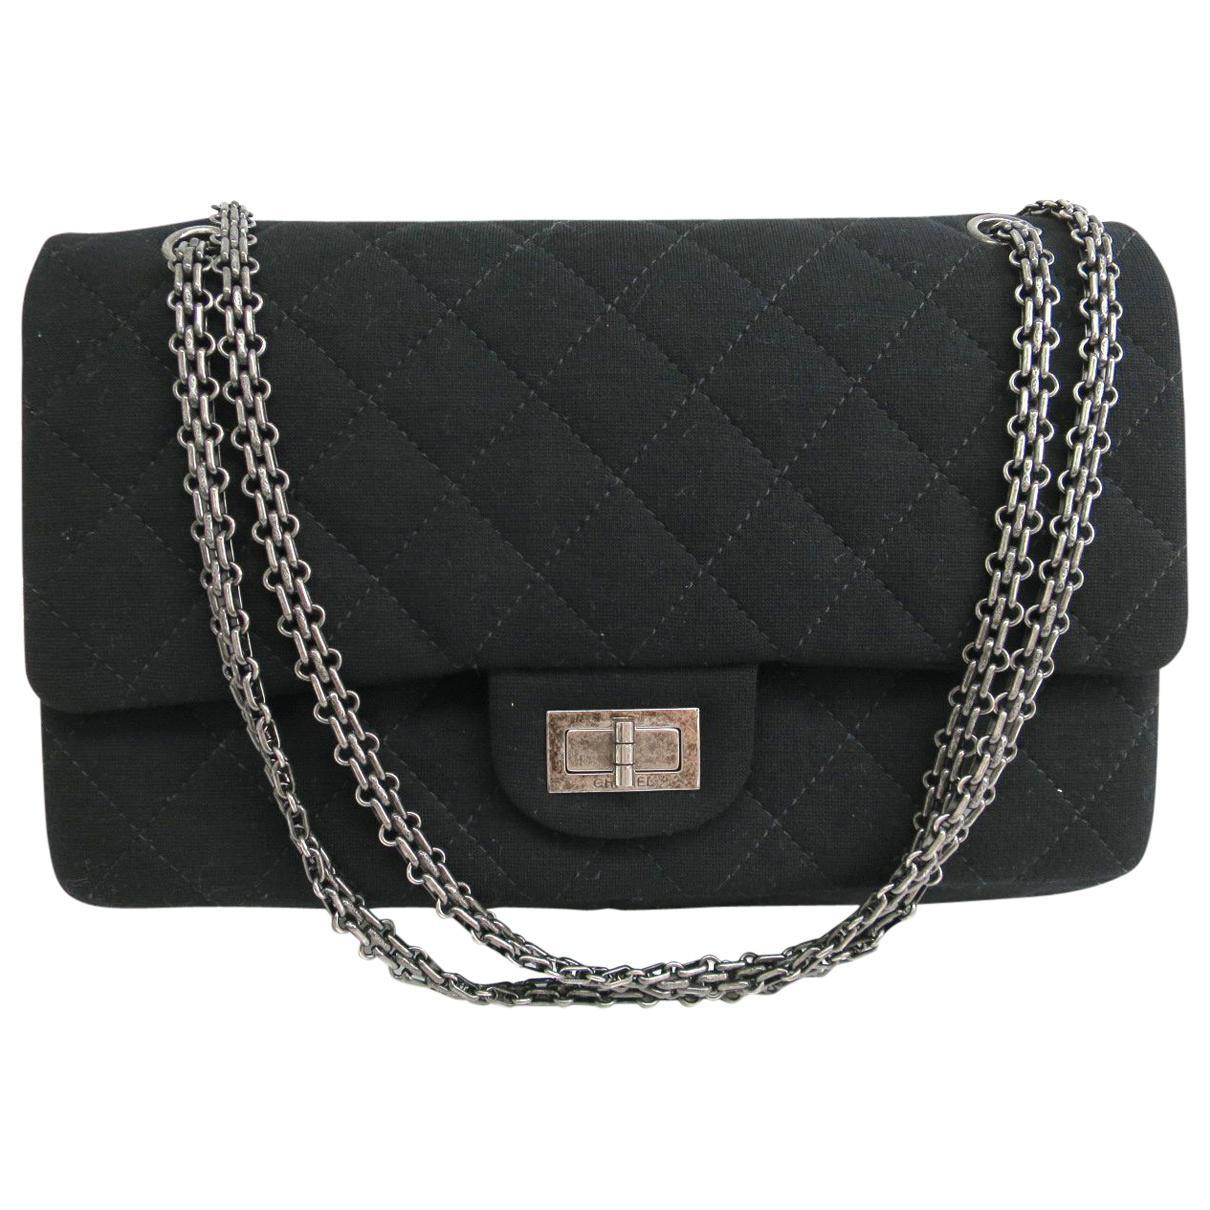 Pre-owned - 2.55 cloth handbag Chanel 0daqNj